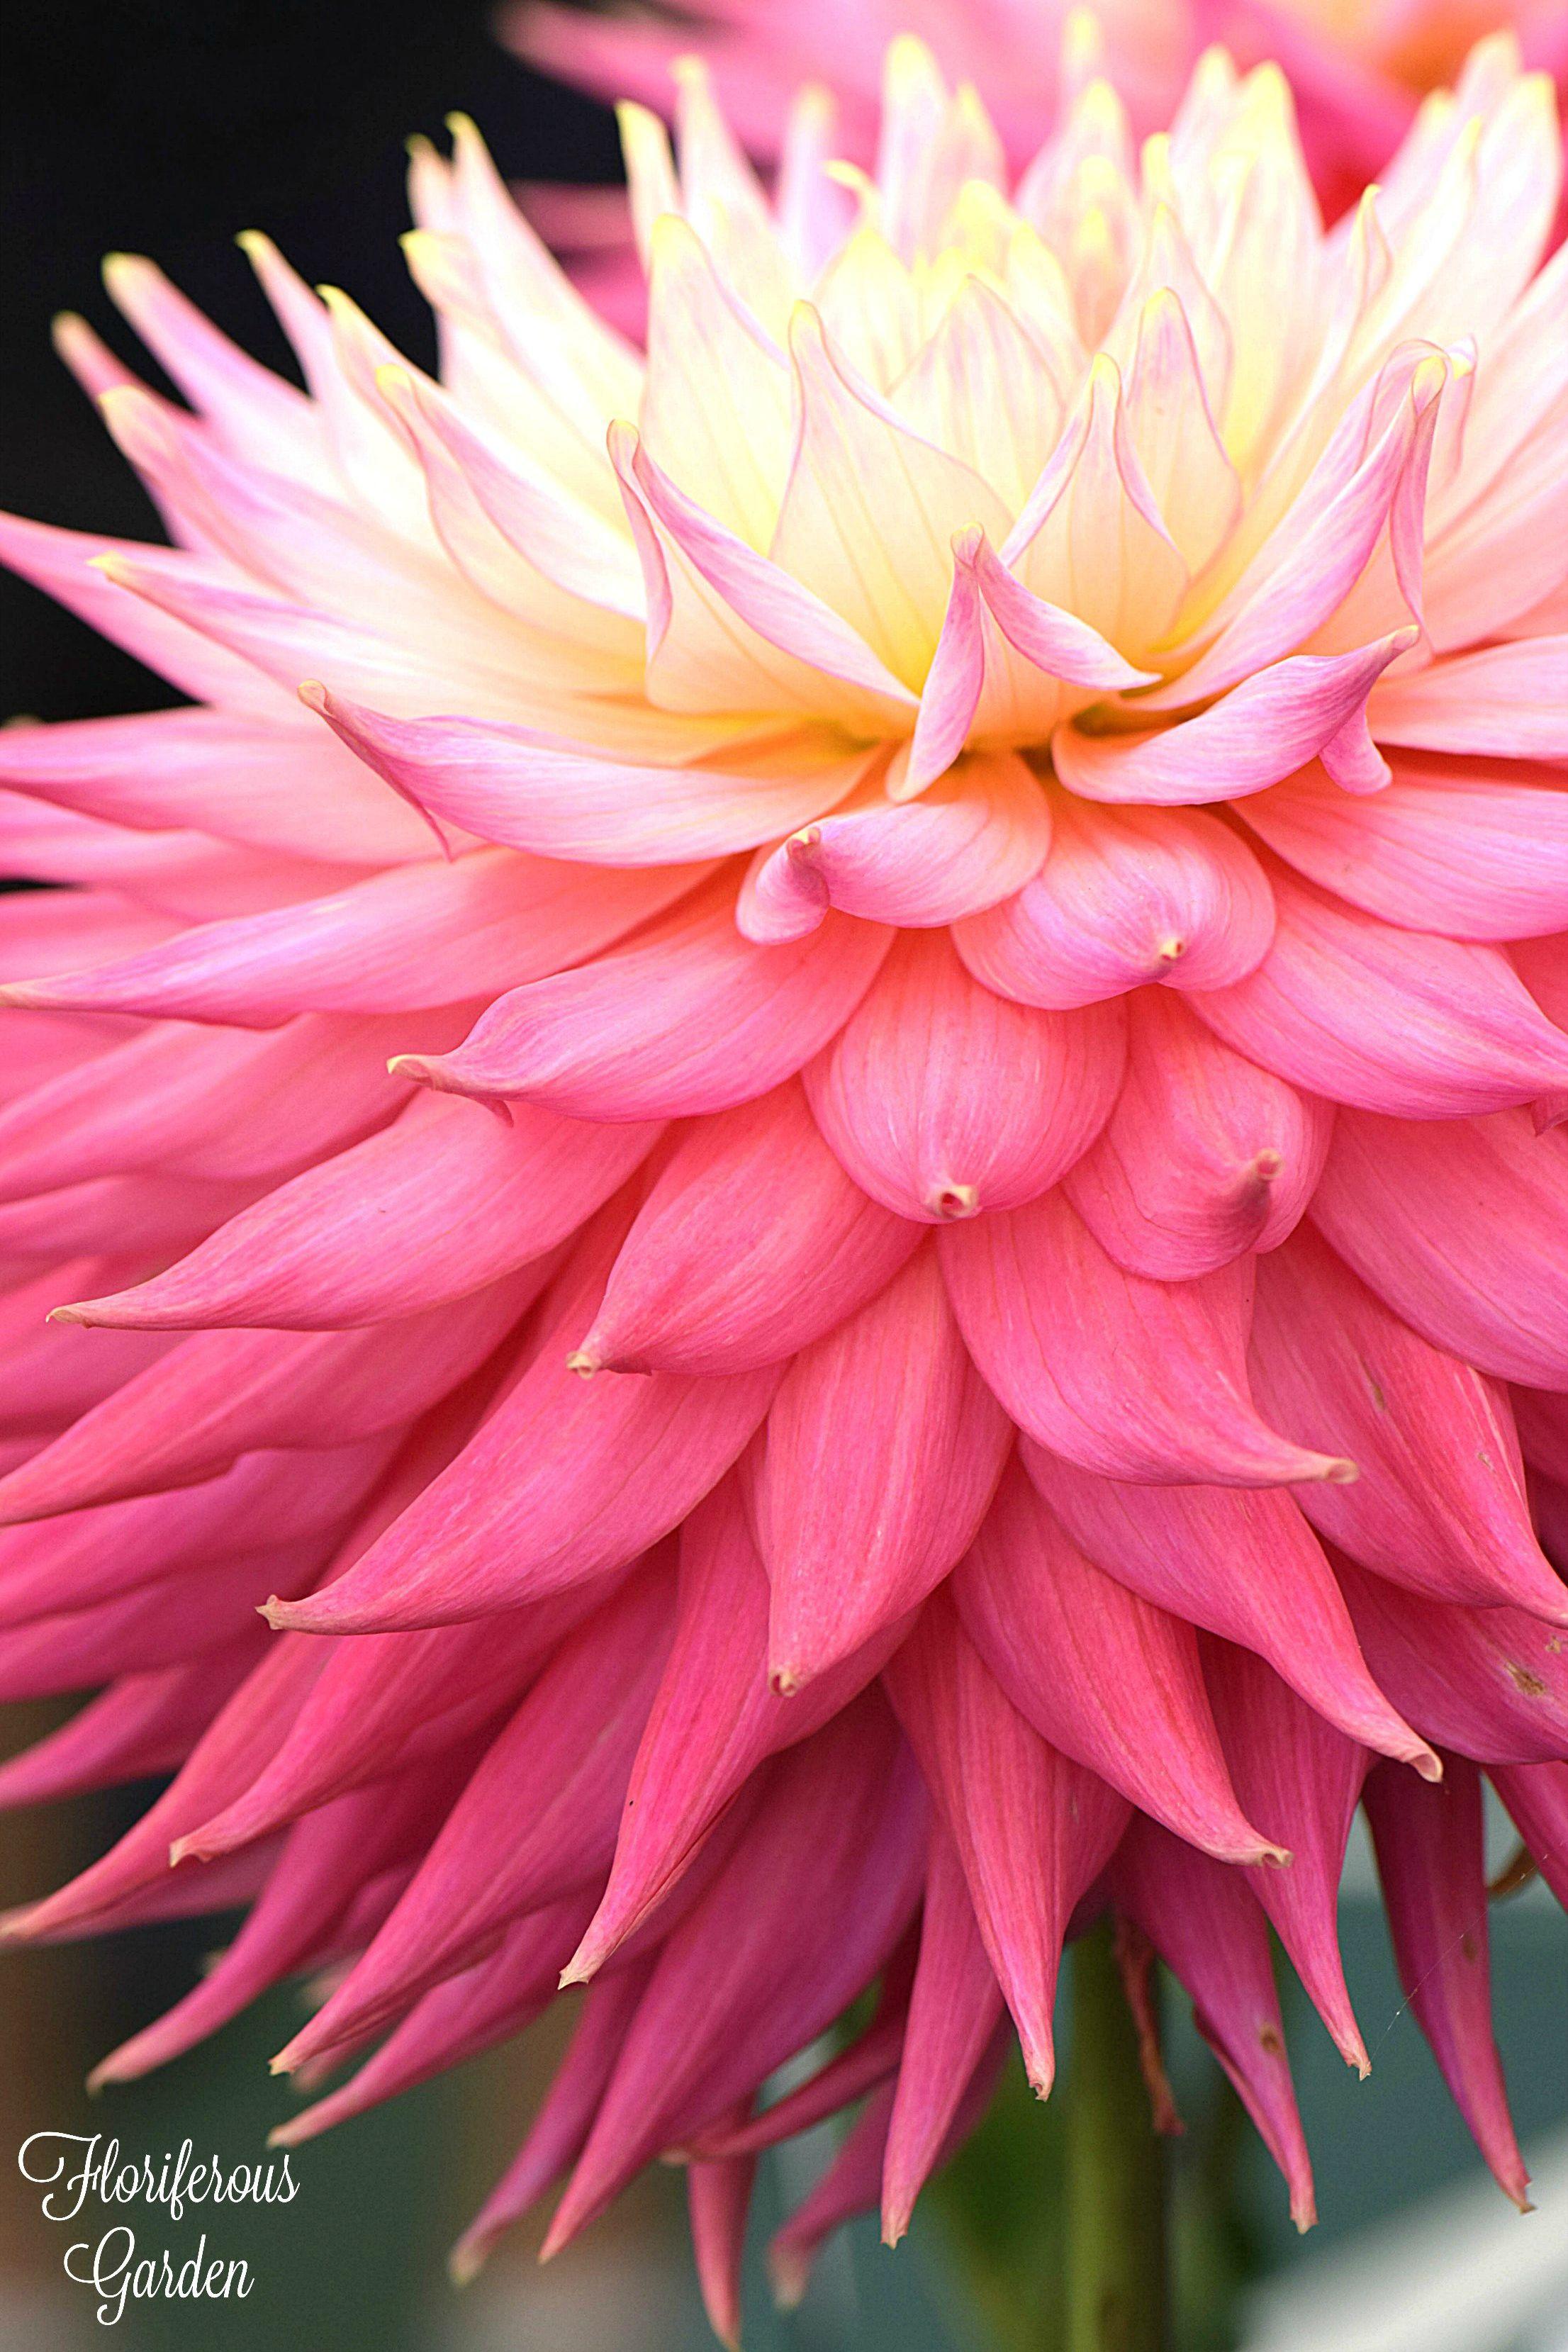 Dahlia jupiter rose httpsfloriferous garden flower dahlia jupiter rose httpsfloriferous garden izmirmasajfo